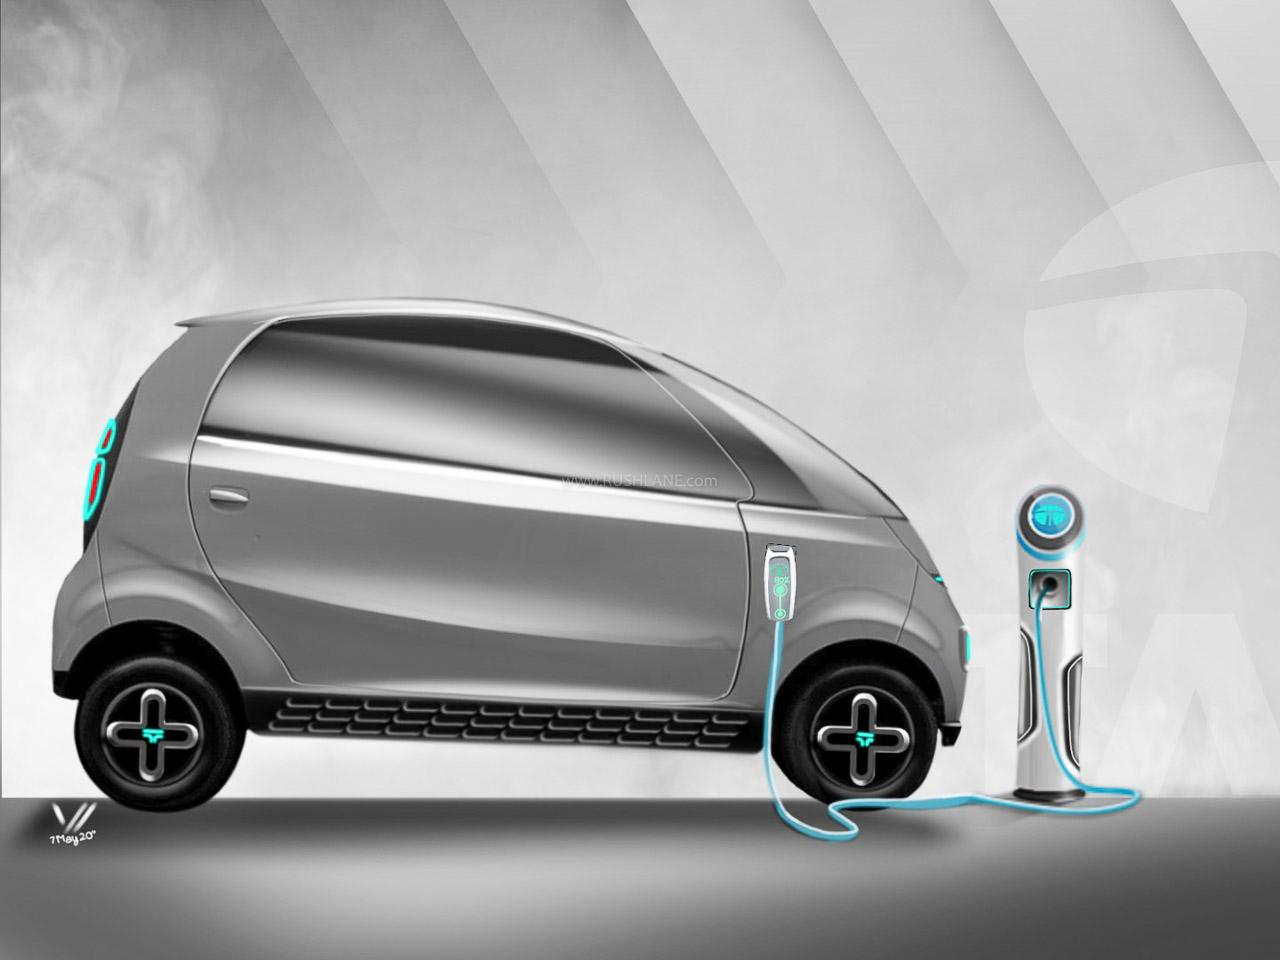 Tata Nano Electric iNano EV Concept by Vishal Verma